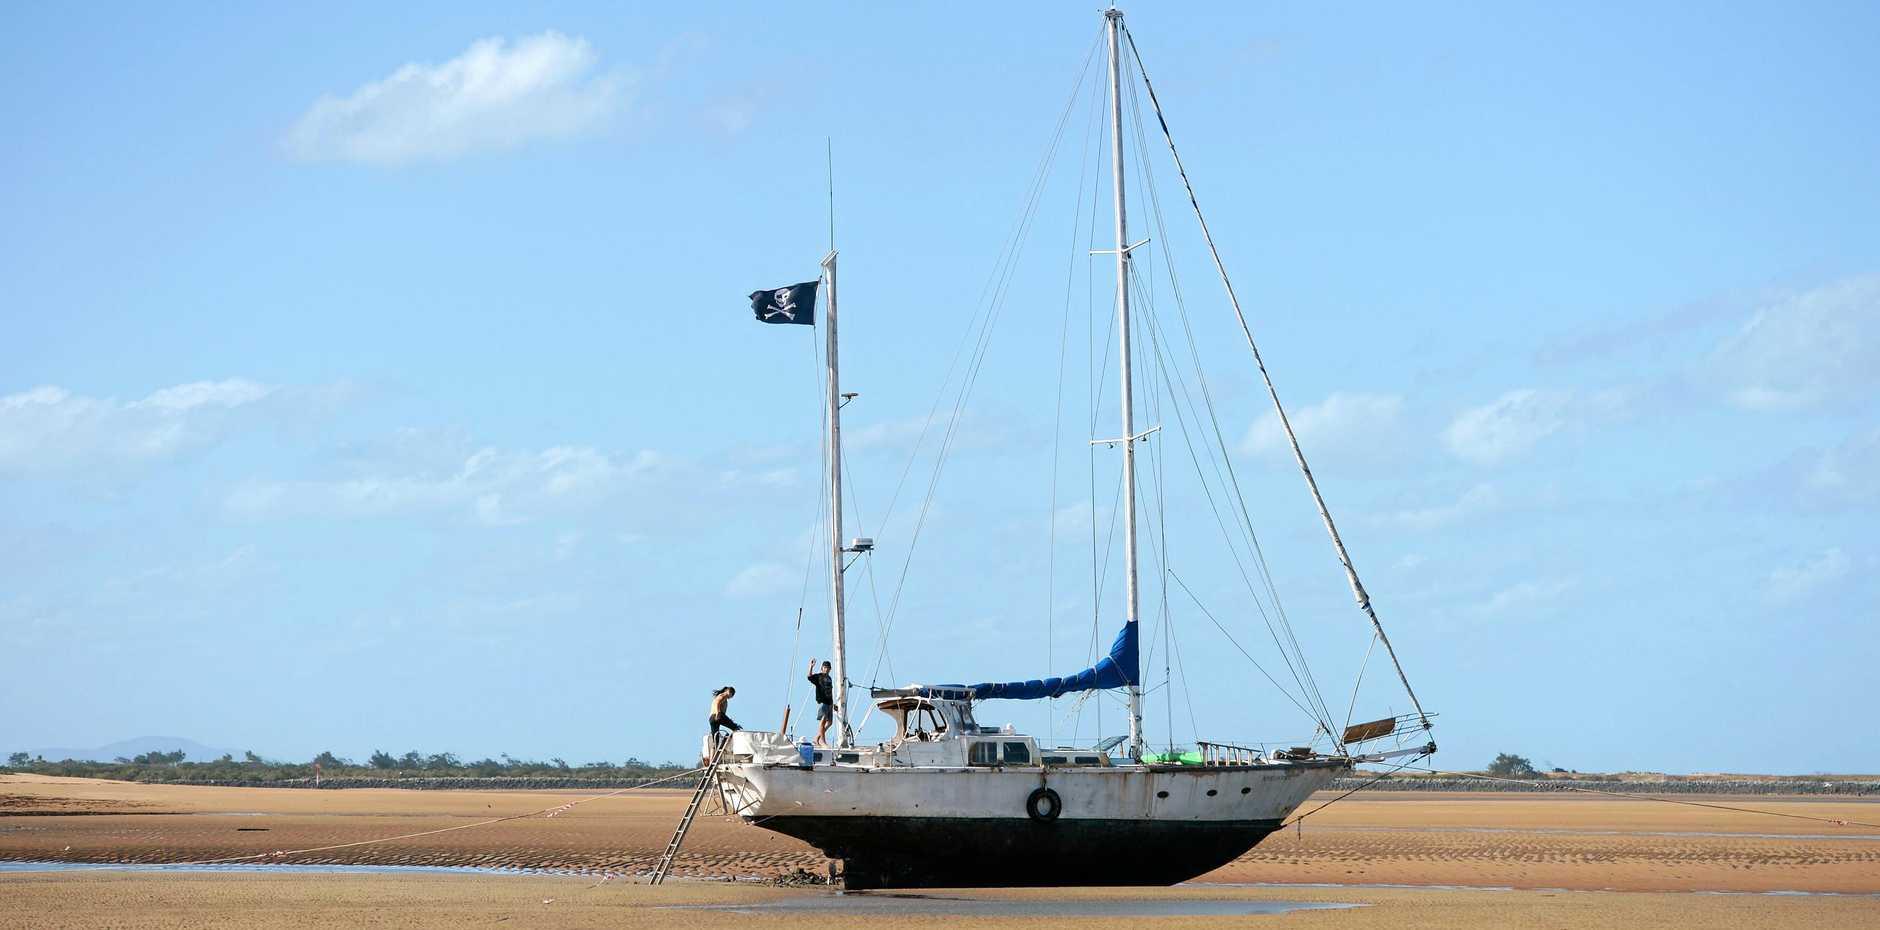 Beached Yacht on Town Beach, Mackay